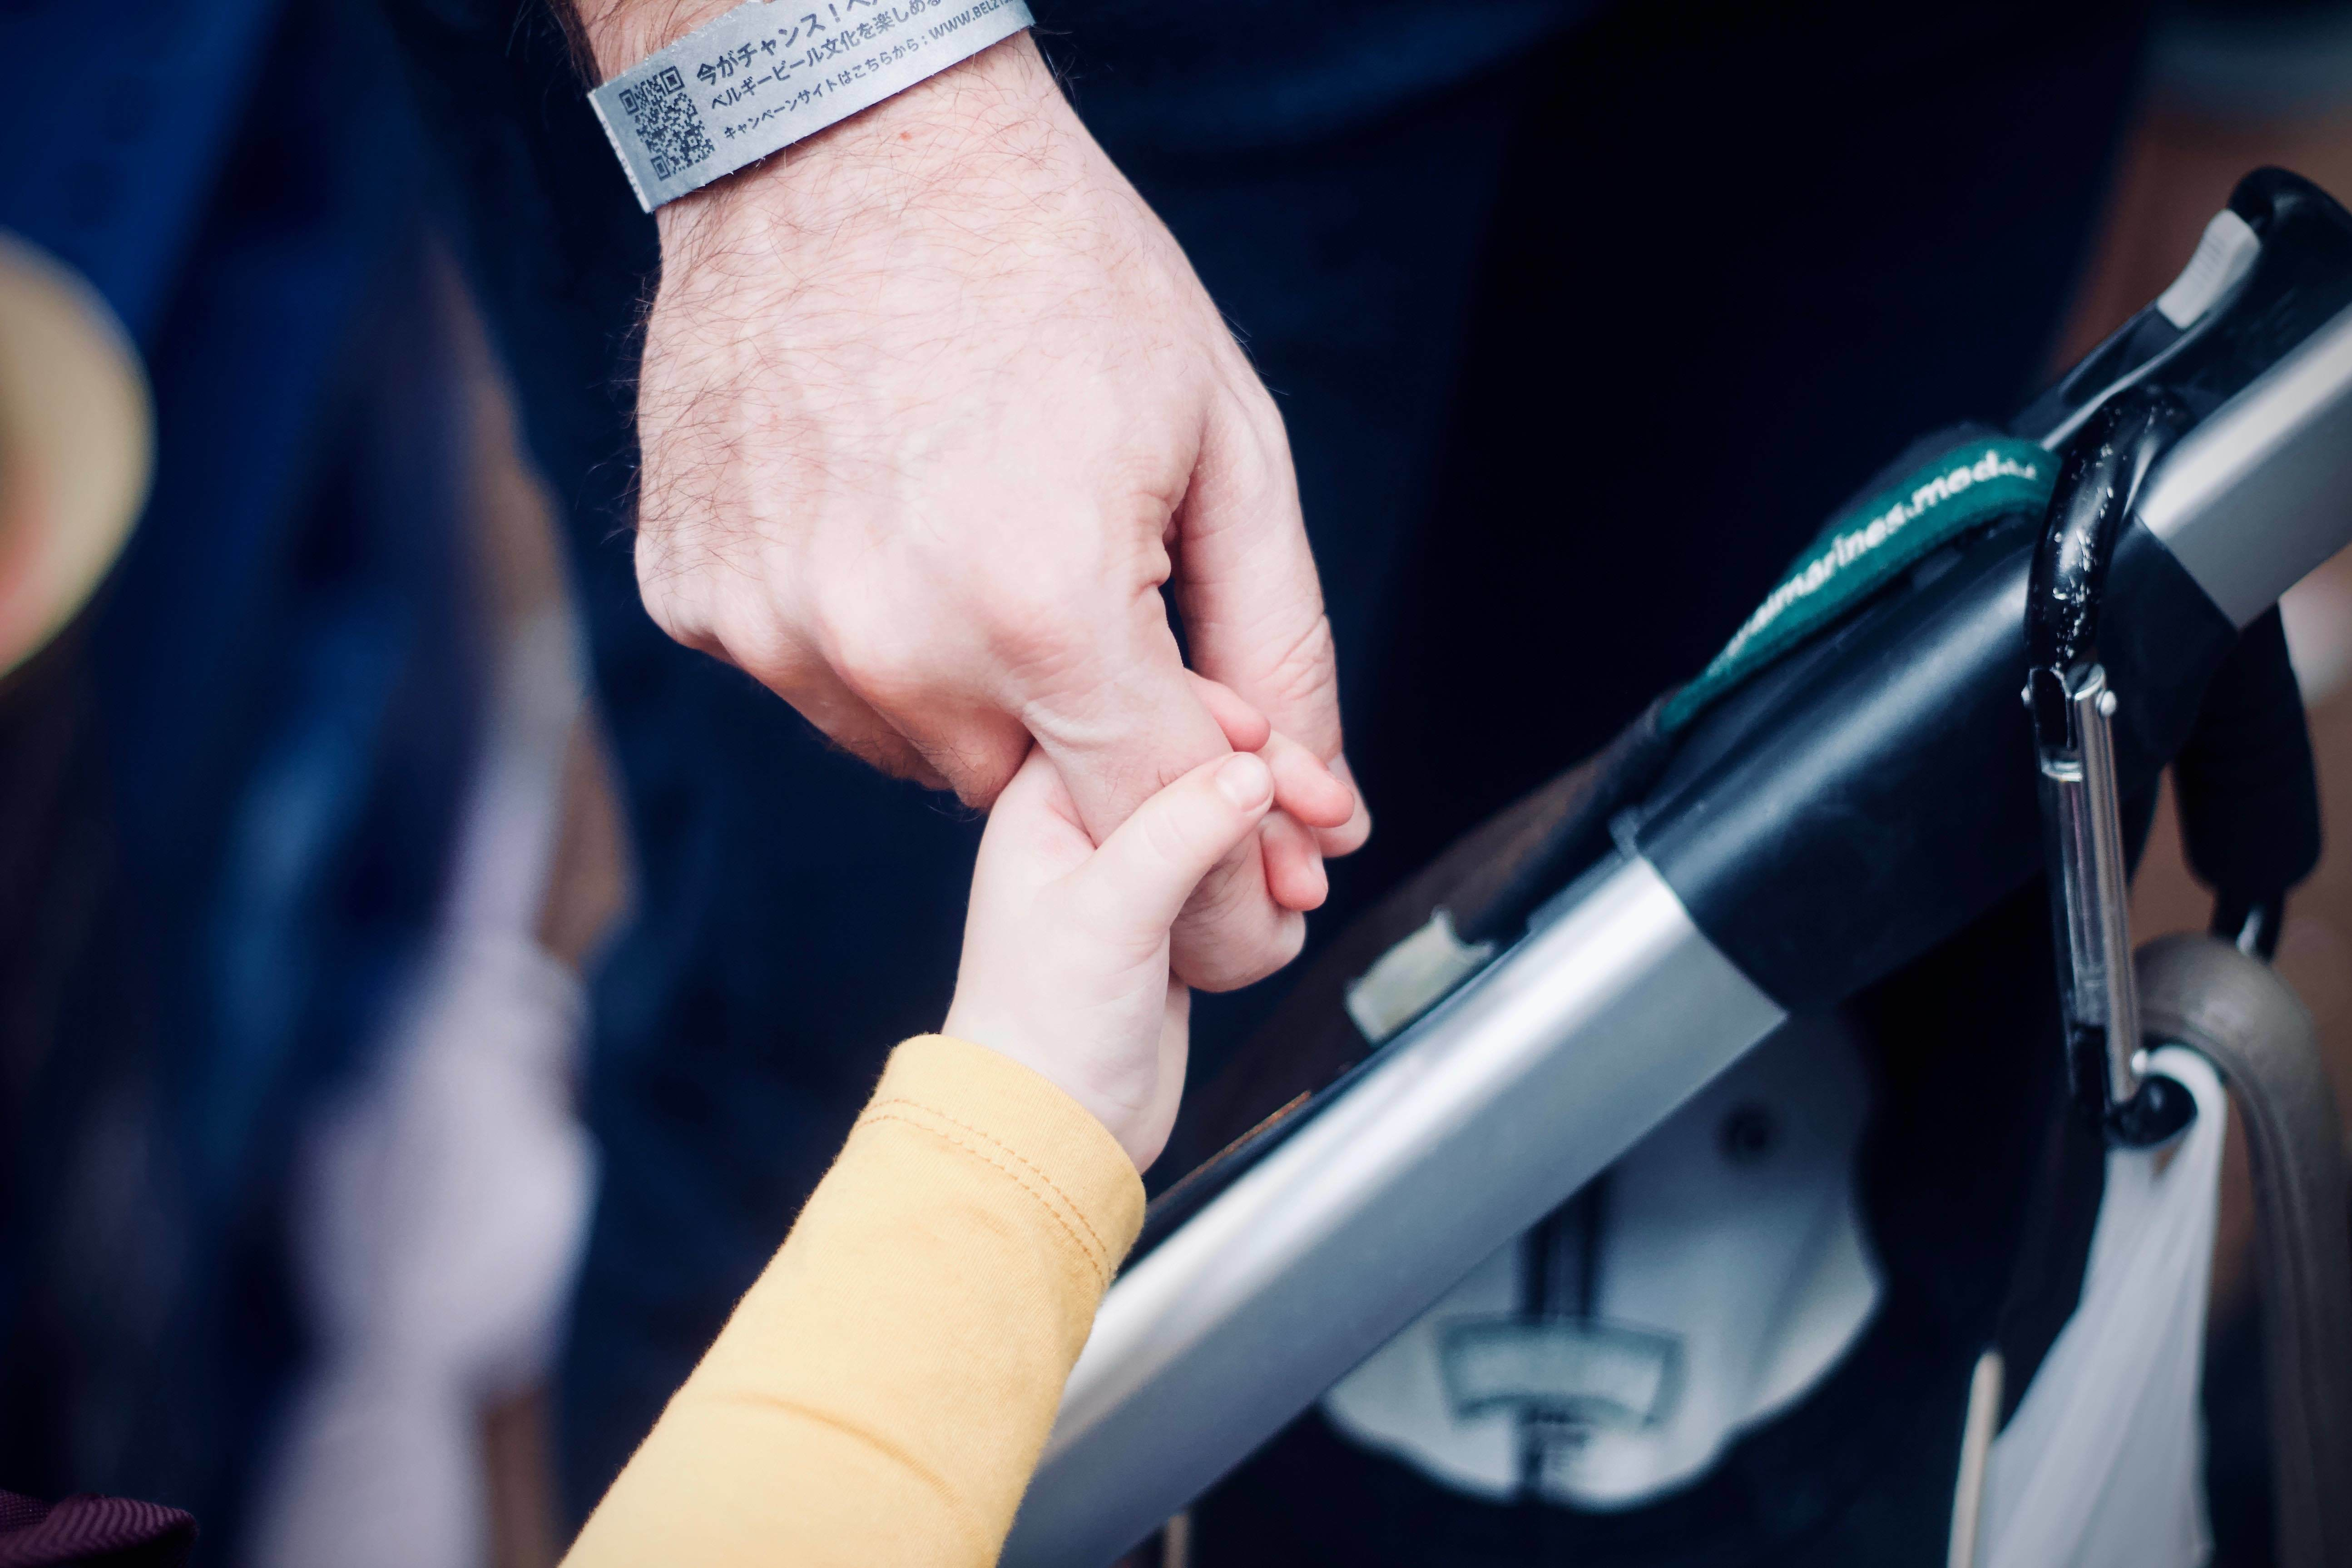 kid and parent hands